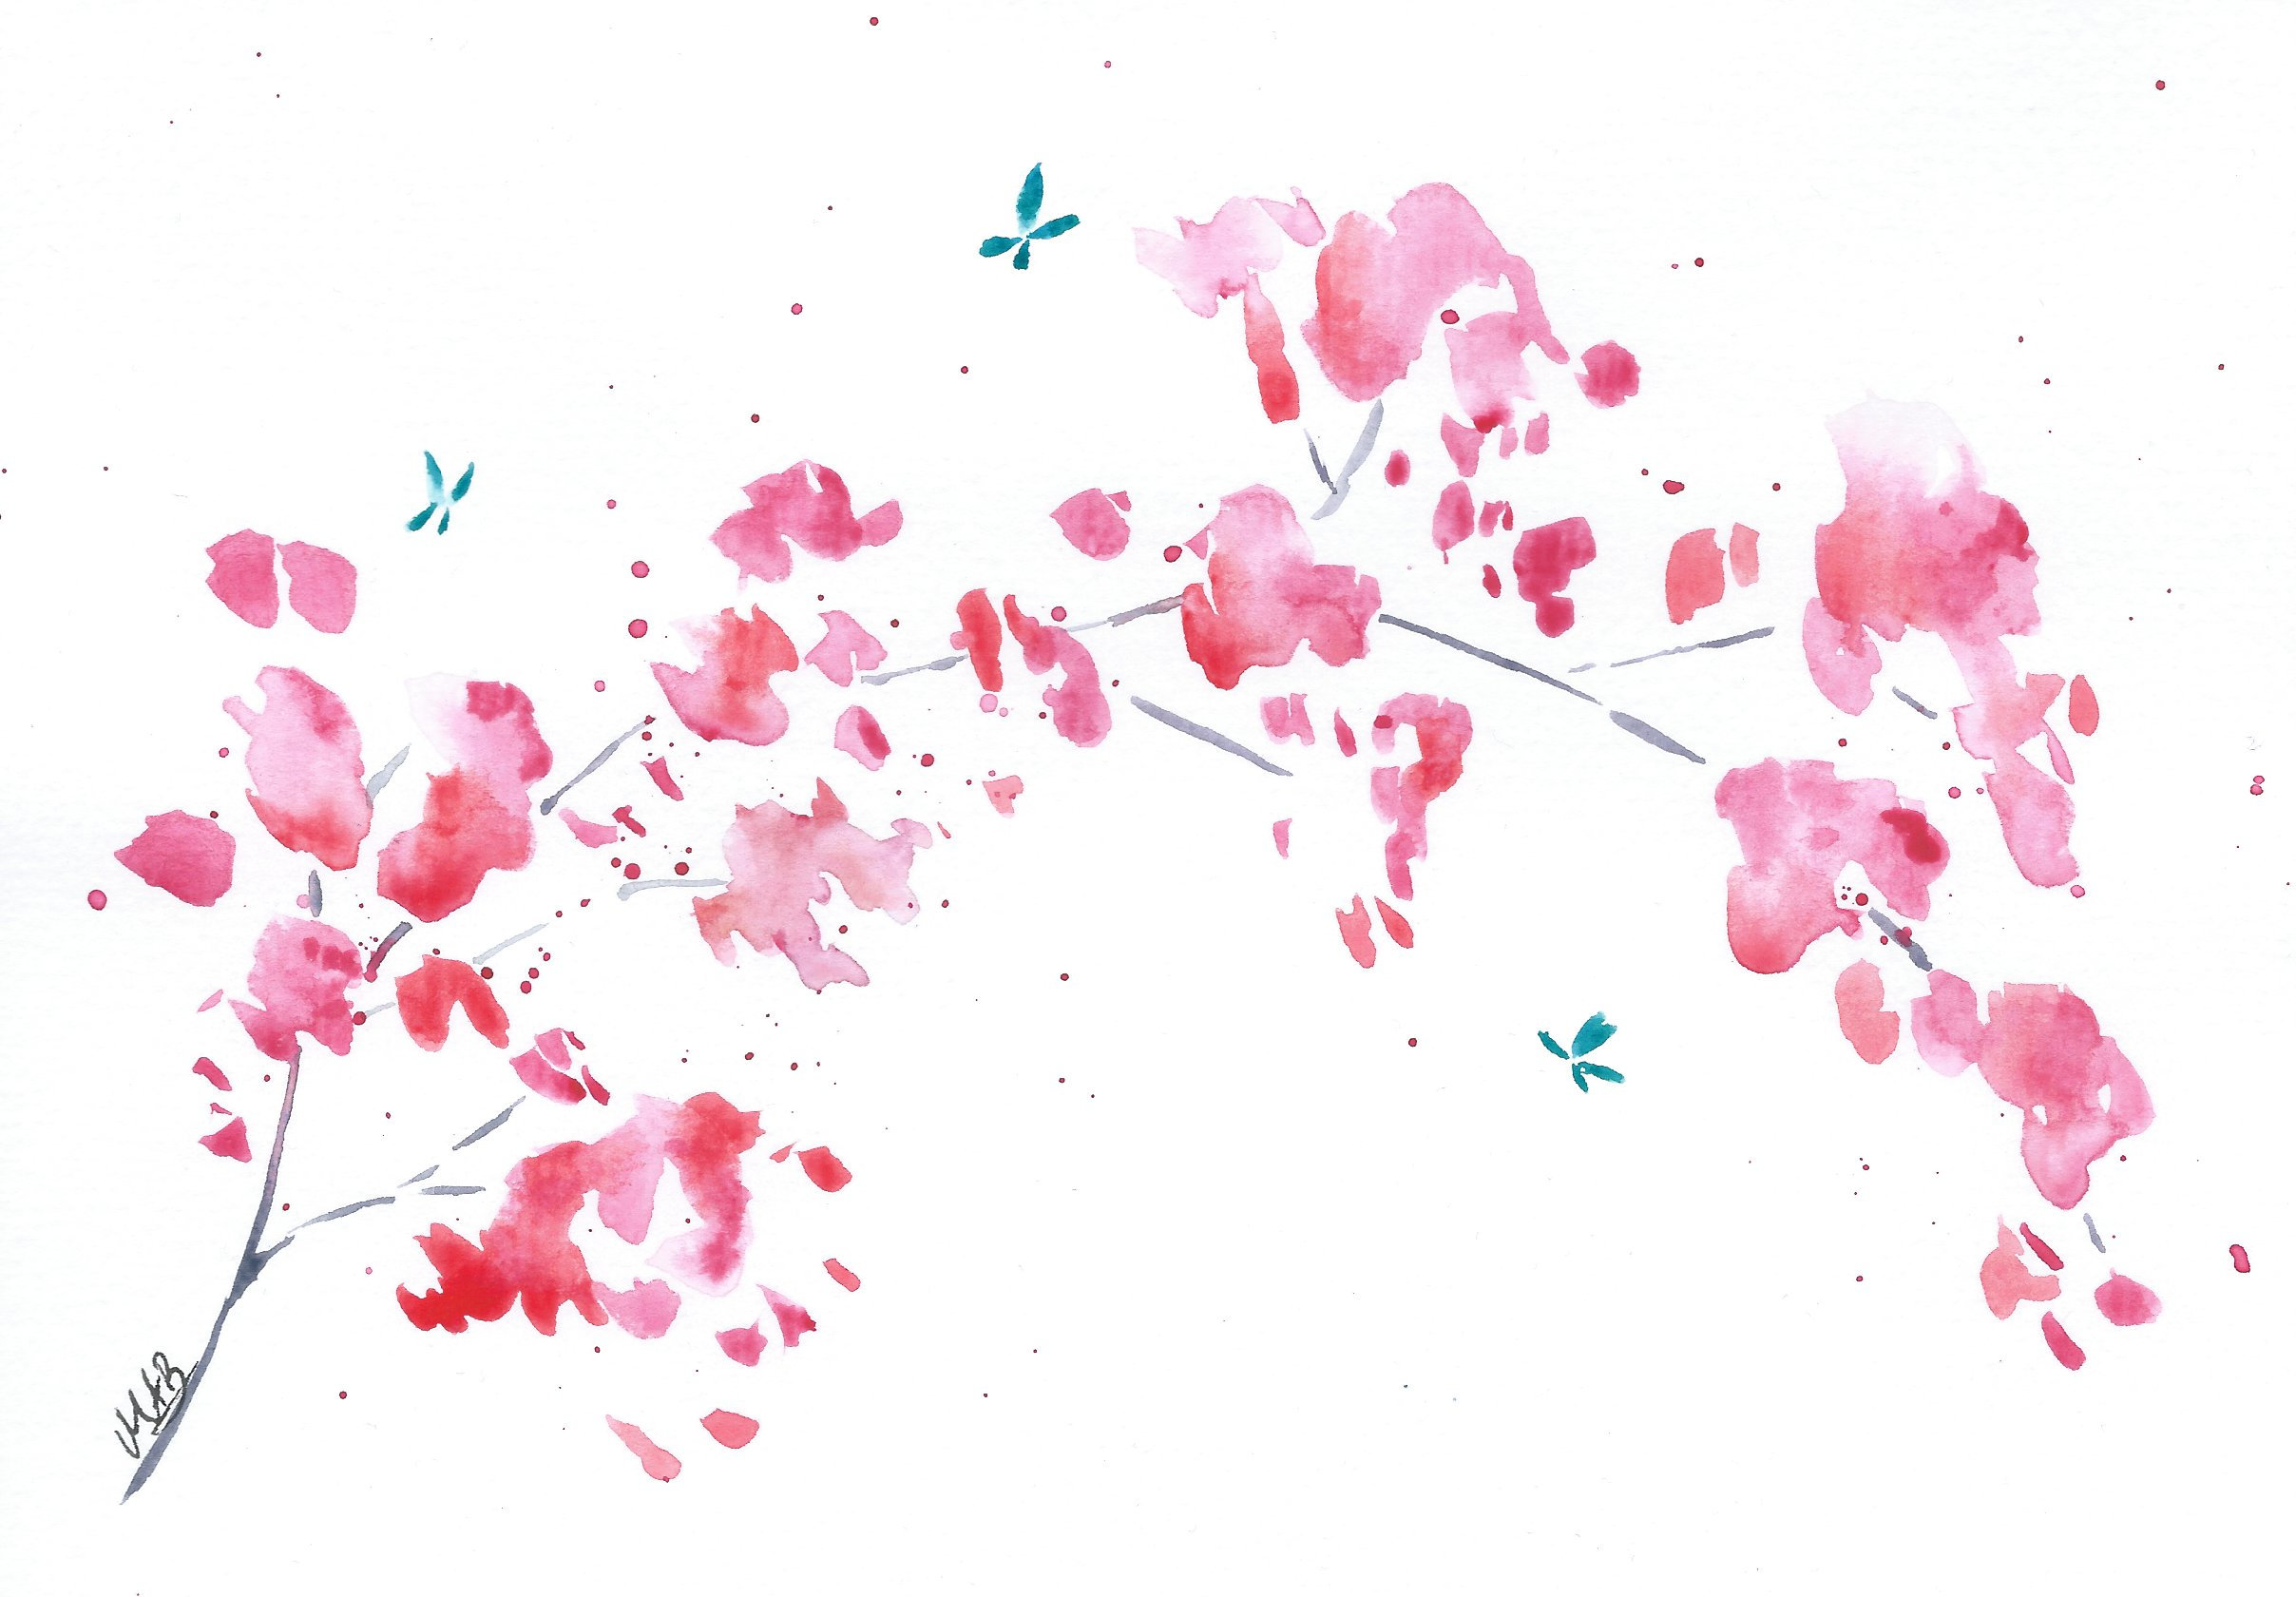 2416x1680 Cherry Blossom Painting Original Watercolor Painting Cherry